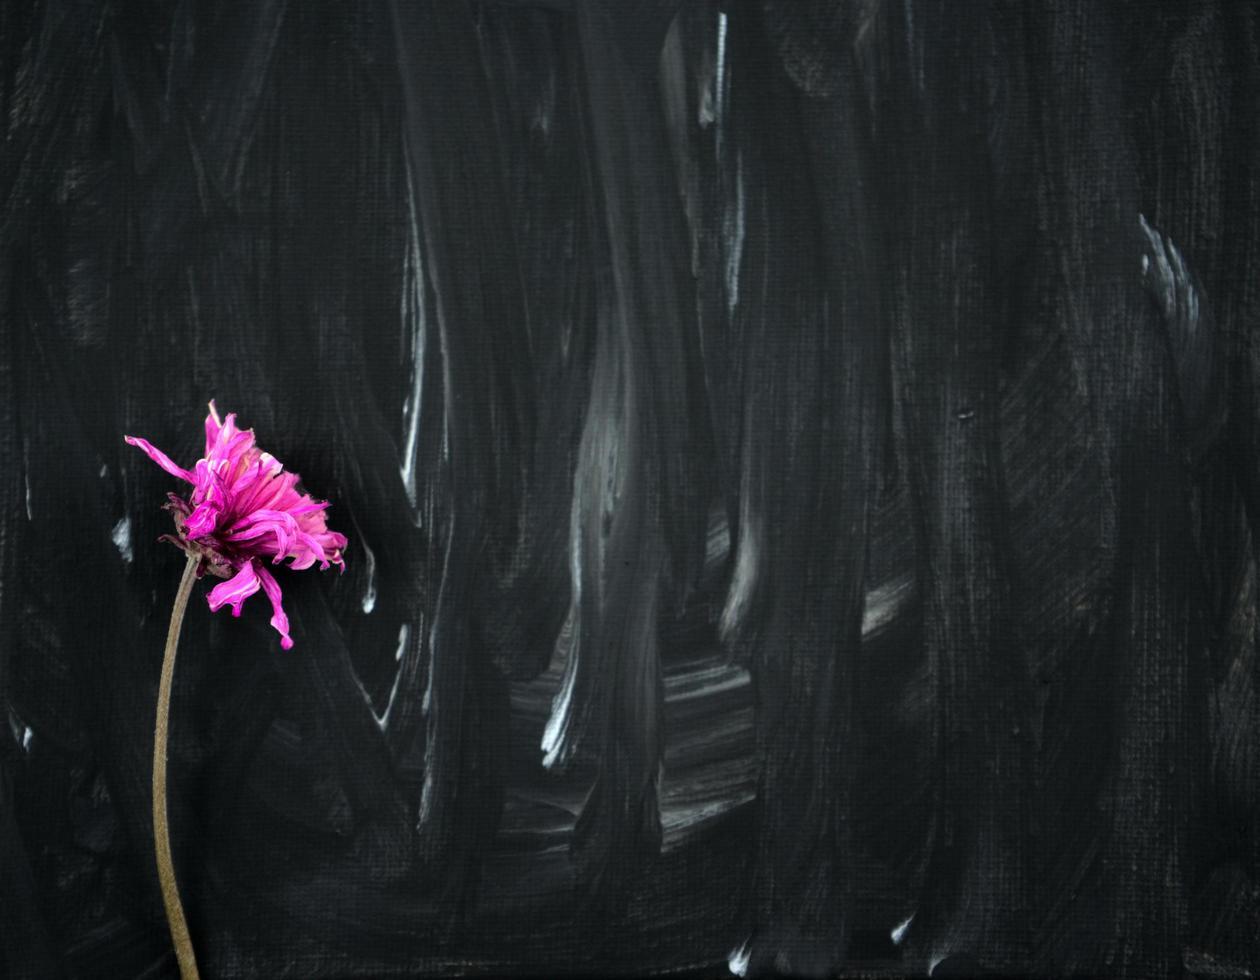 Flor rosa púrpura seca sobre fondo de pintura abstracta en blanco y negro foto